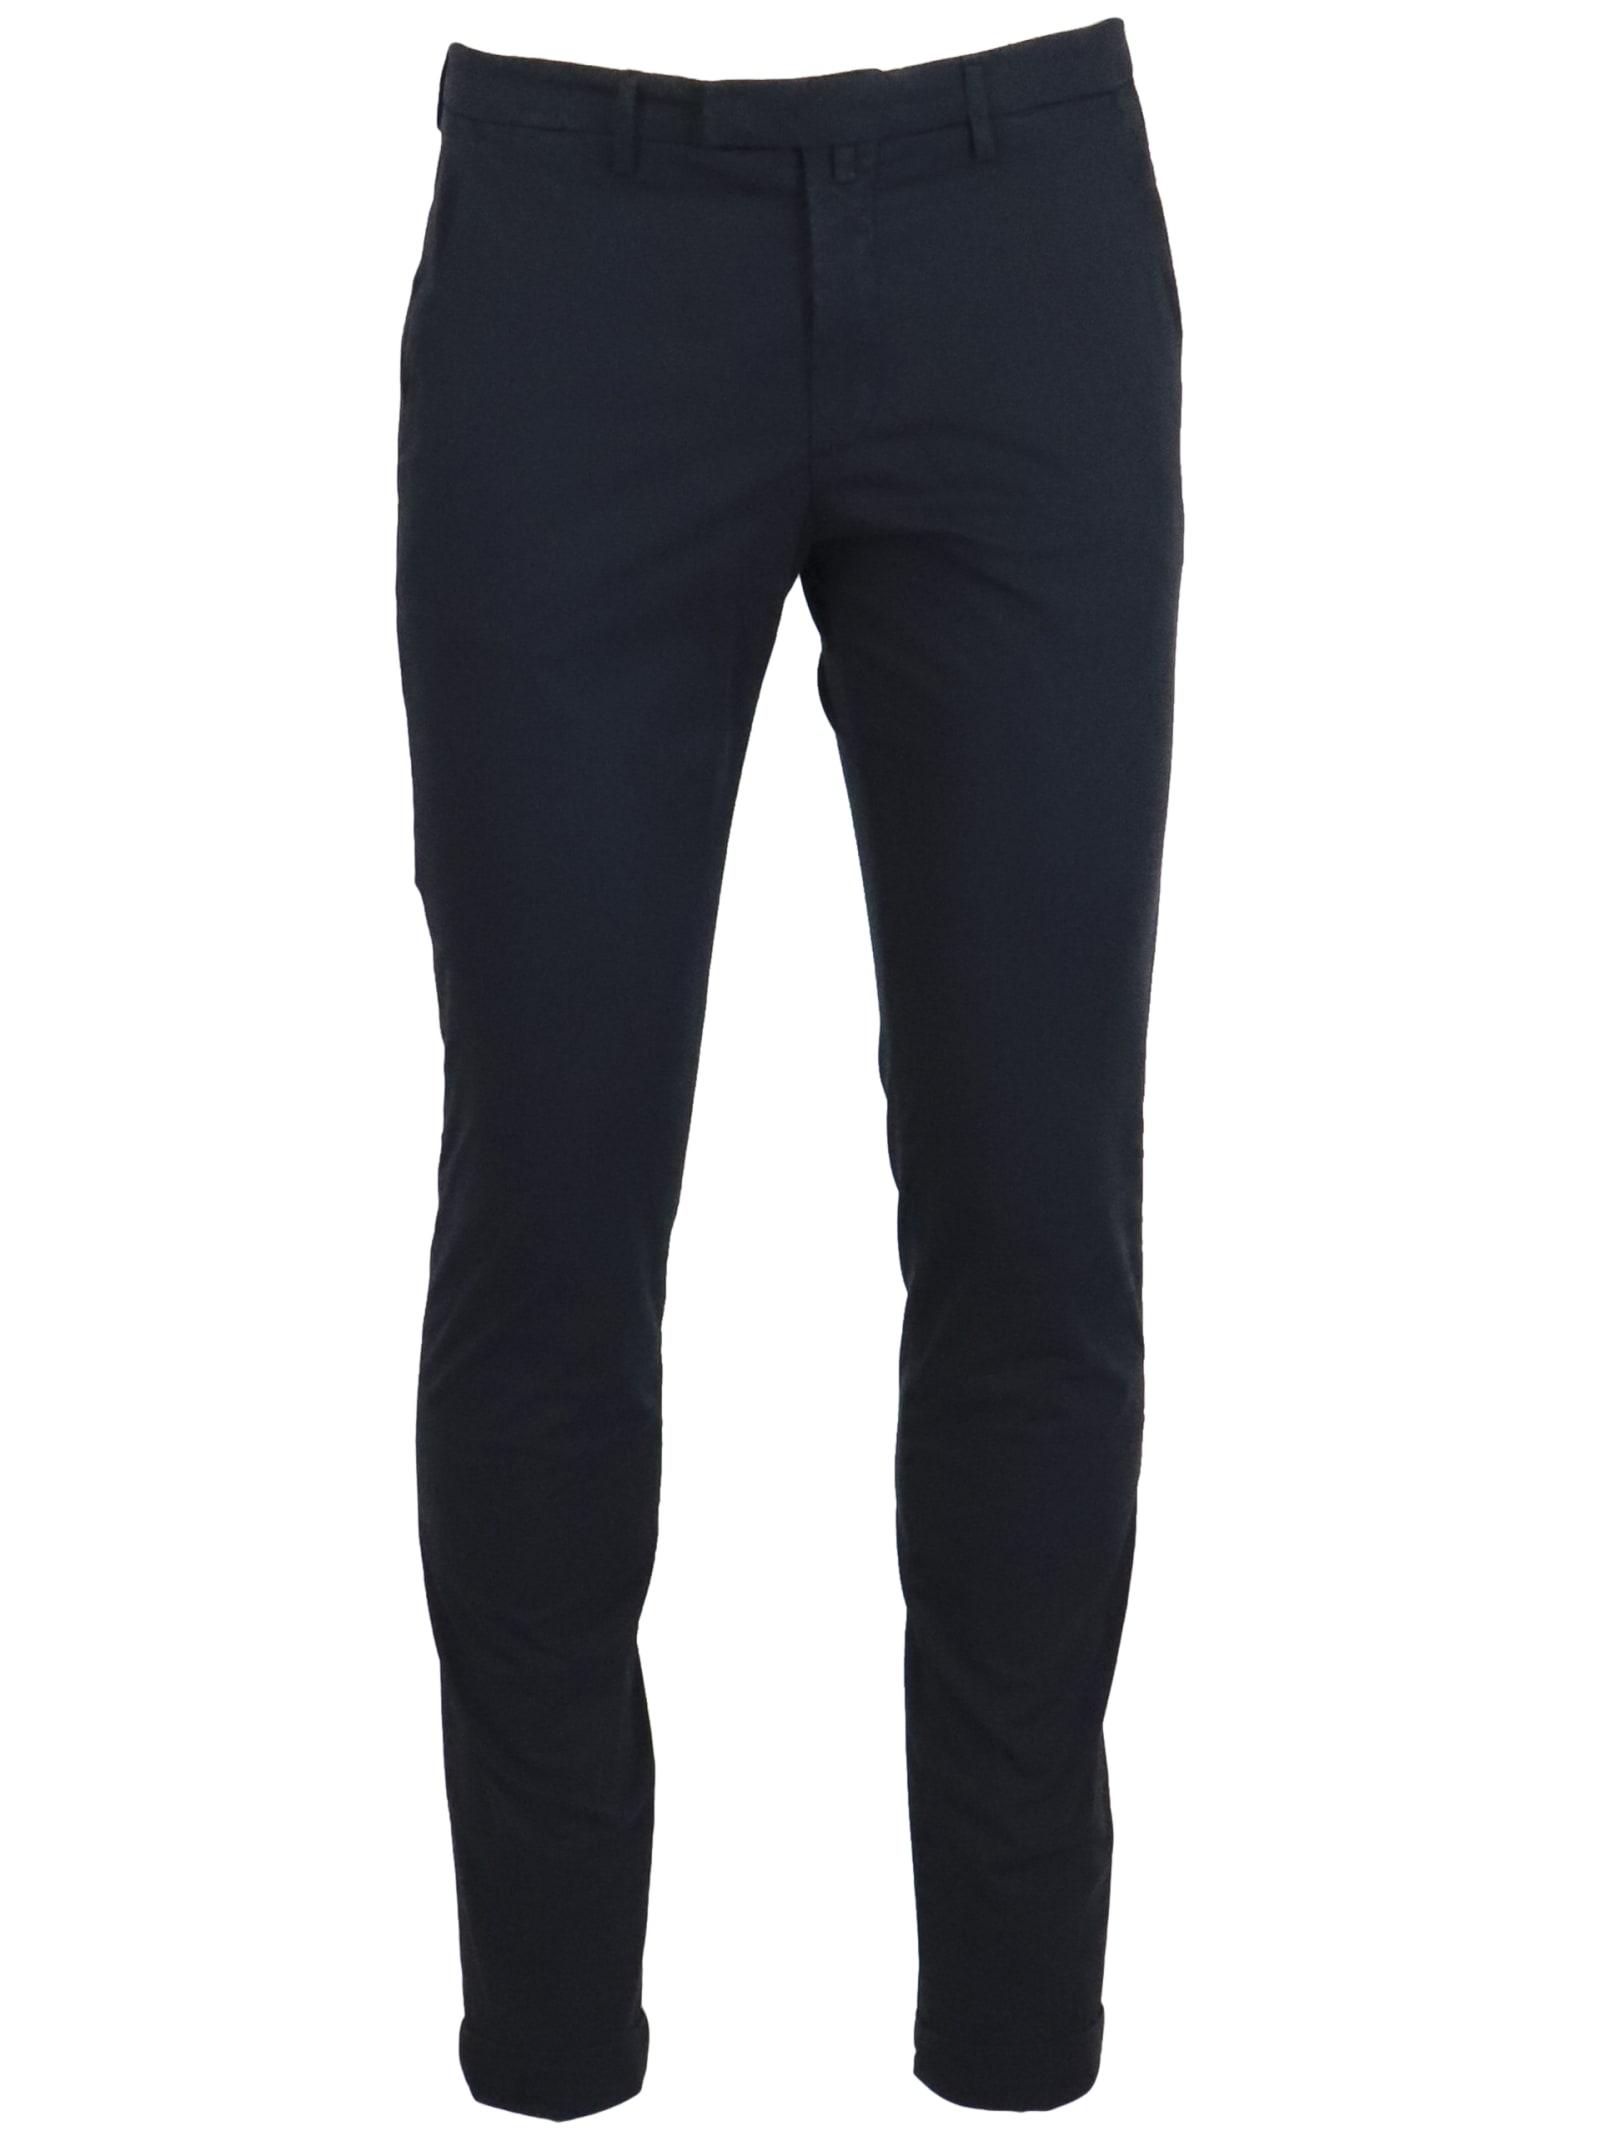 1949 Pantal. Tasca America Trousers